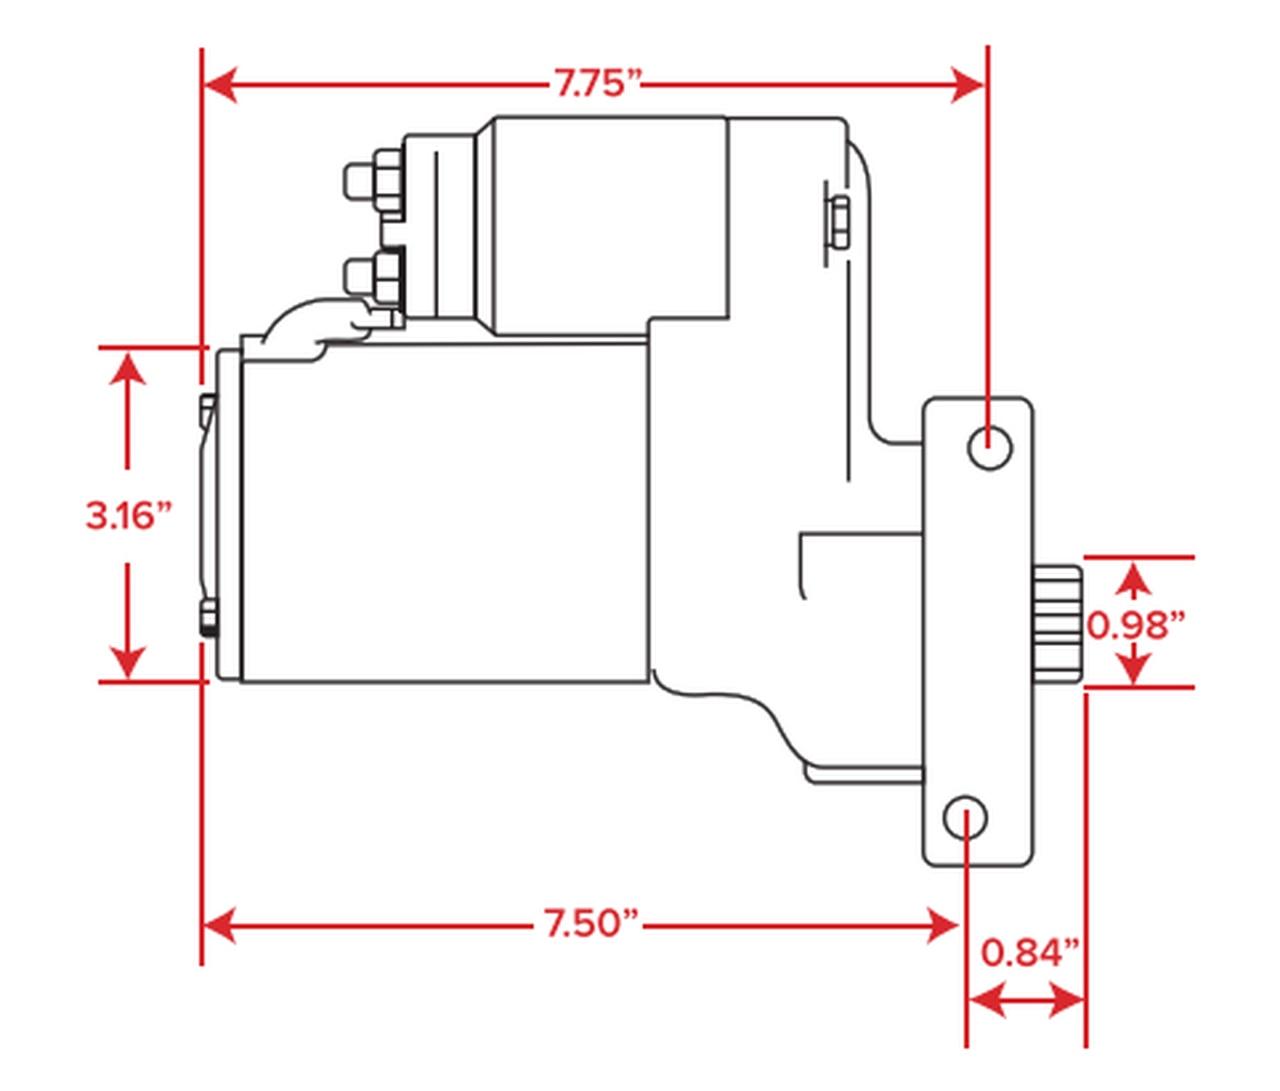 gm mini starter wiring starter kz 8944  gm mini starter wiring diagram download diagram  kz 8944  gm mini starter wiring diagram